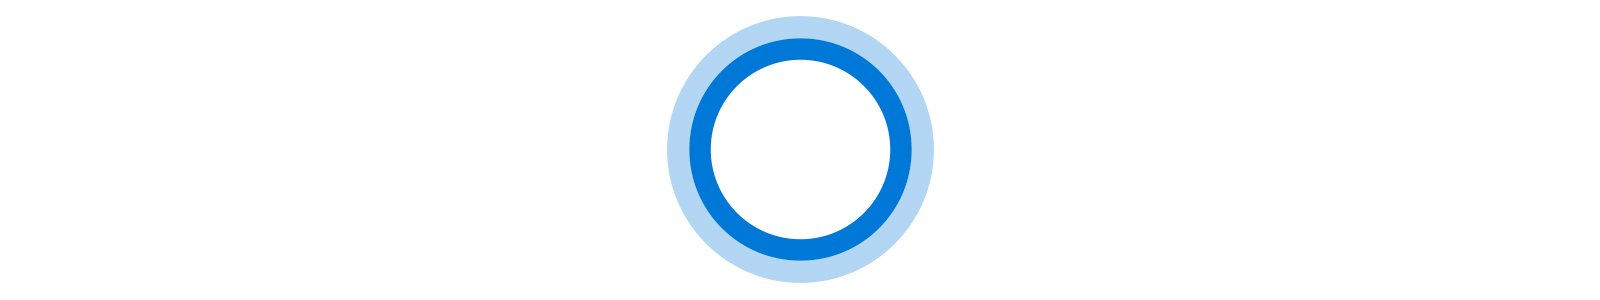 Icône animée de Cortana